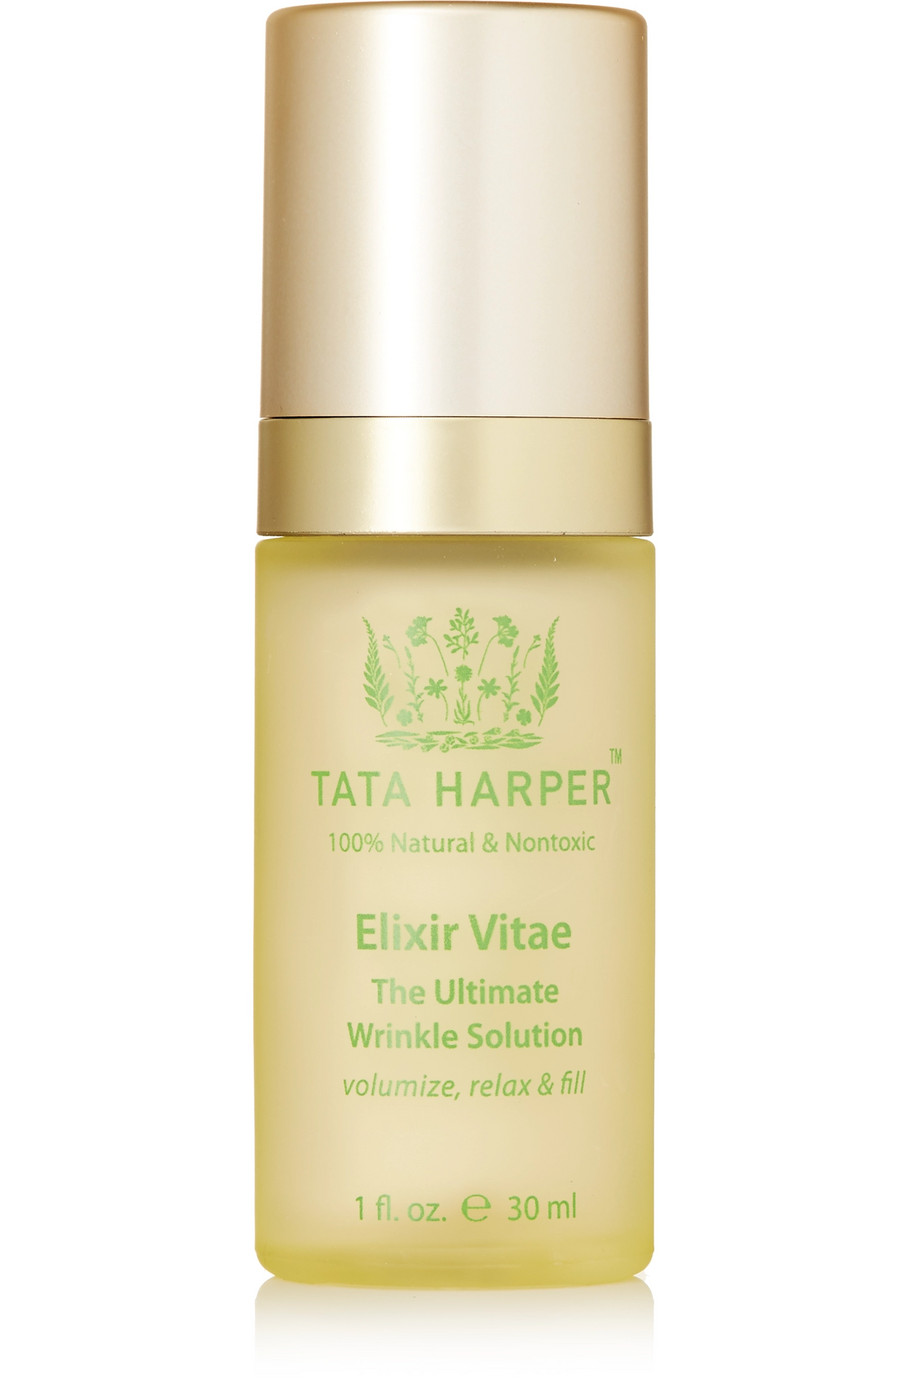 Elixir Vitae Serum, 30ml, by Tata Harper